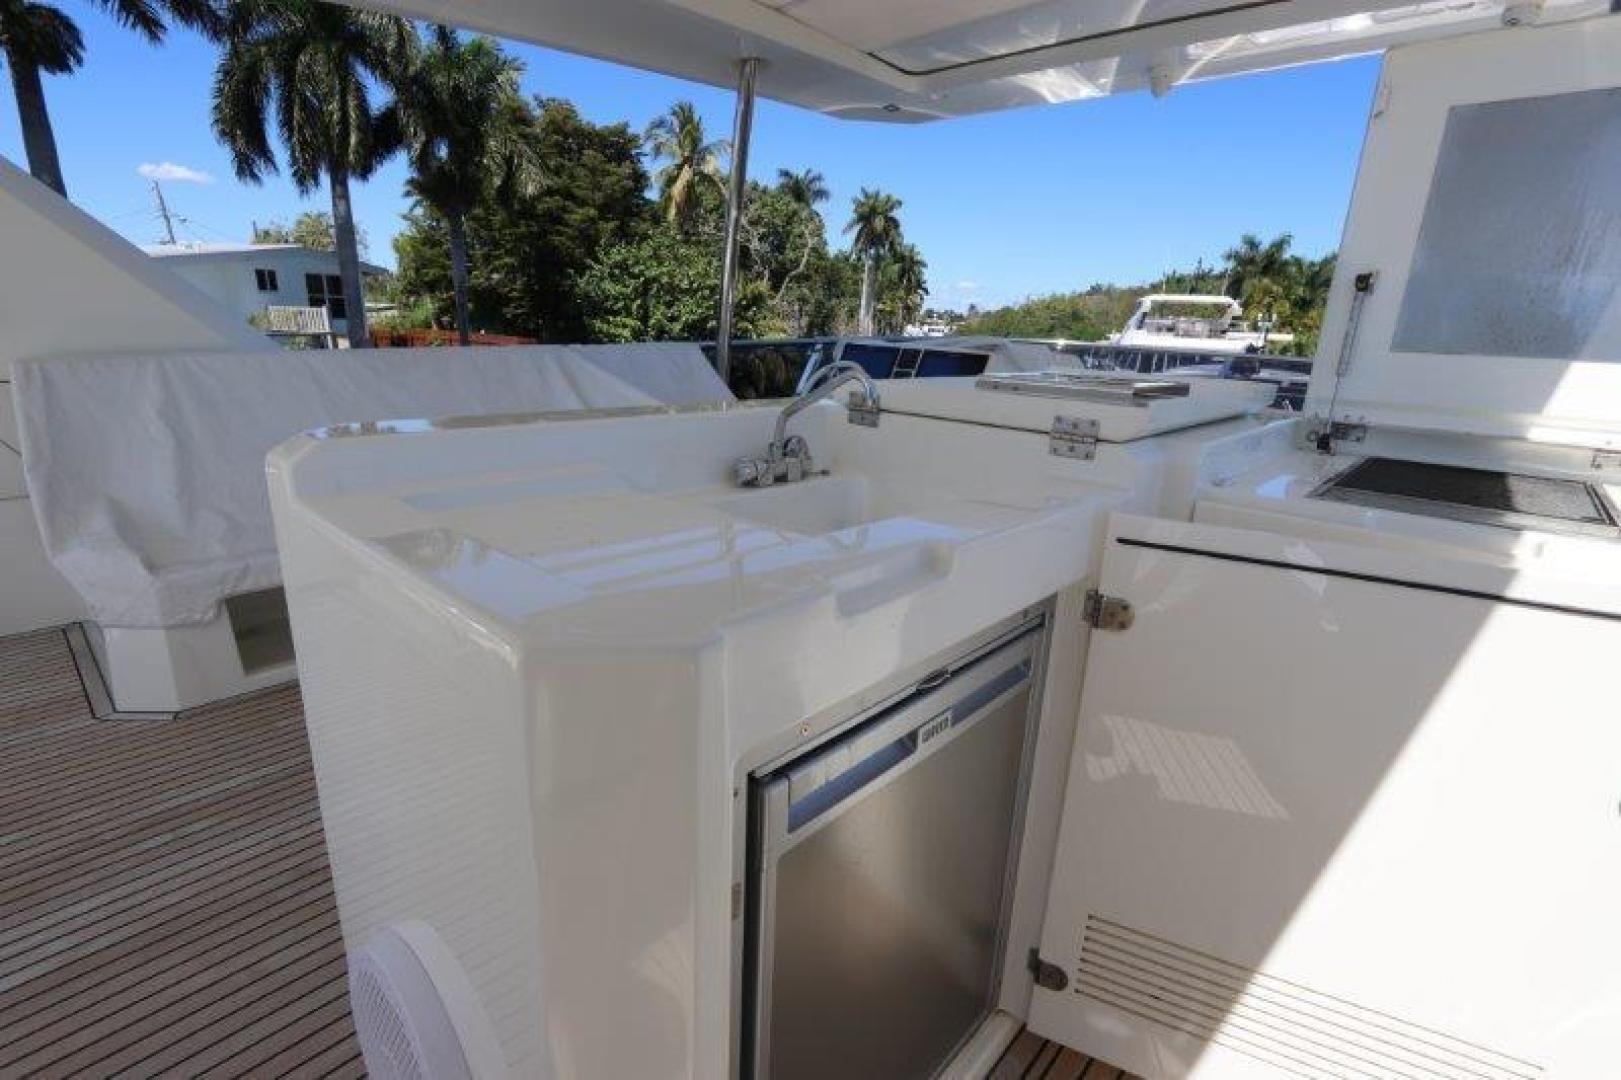 Prestige-Motoryacht 2017-Breathe Easy Fort Lauderdale-Florida-United States-1303871   Thumbnail